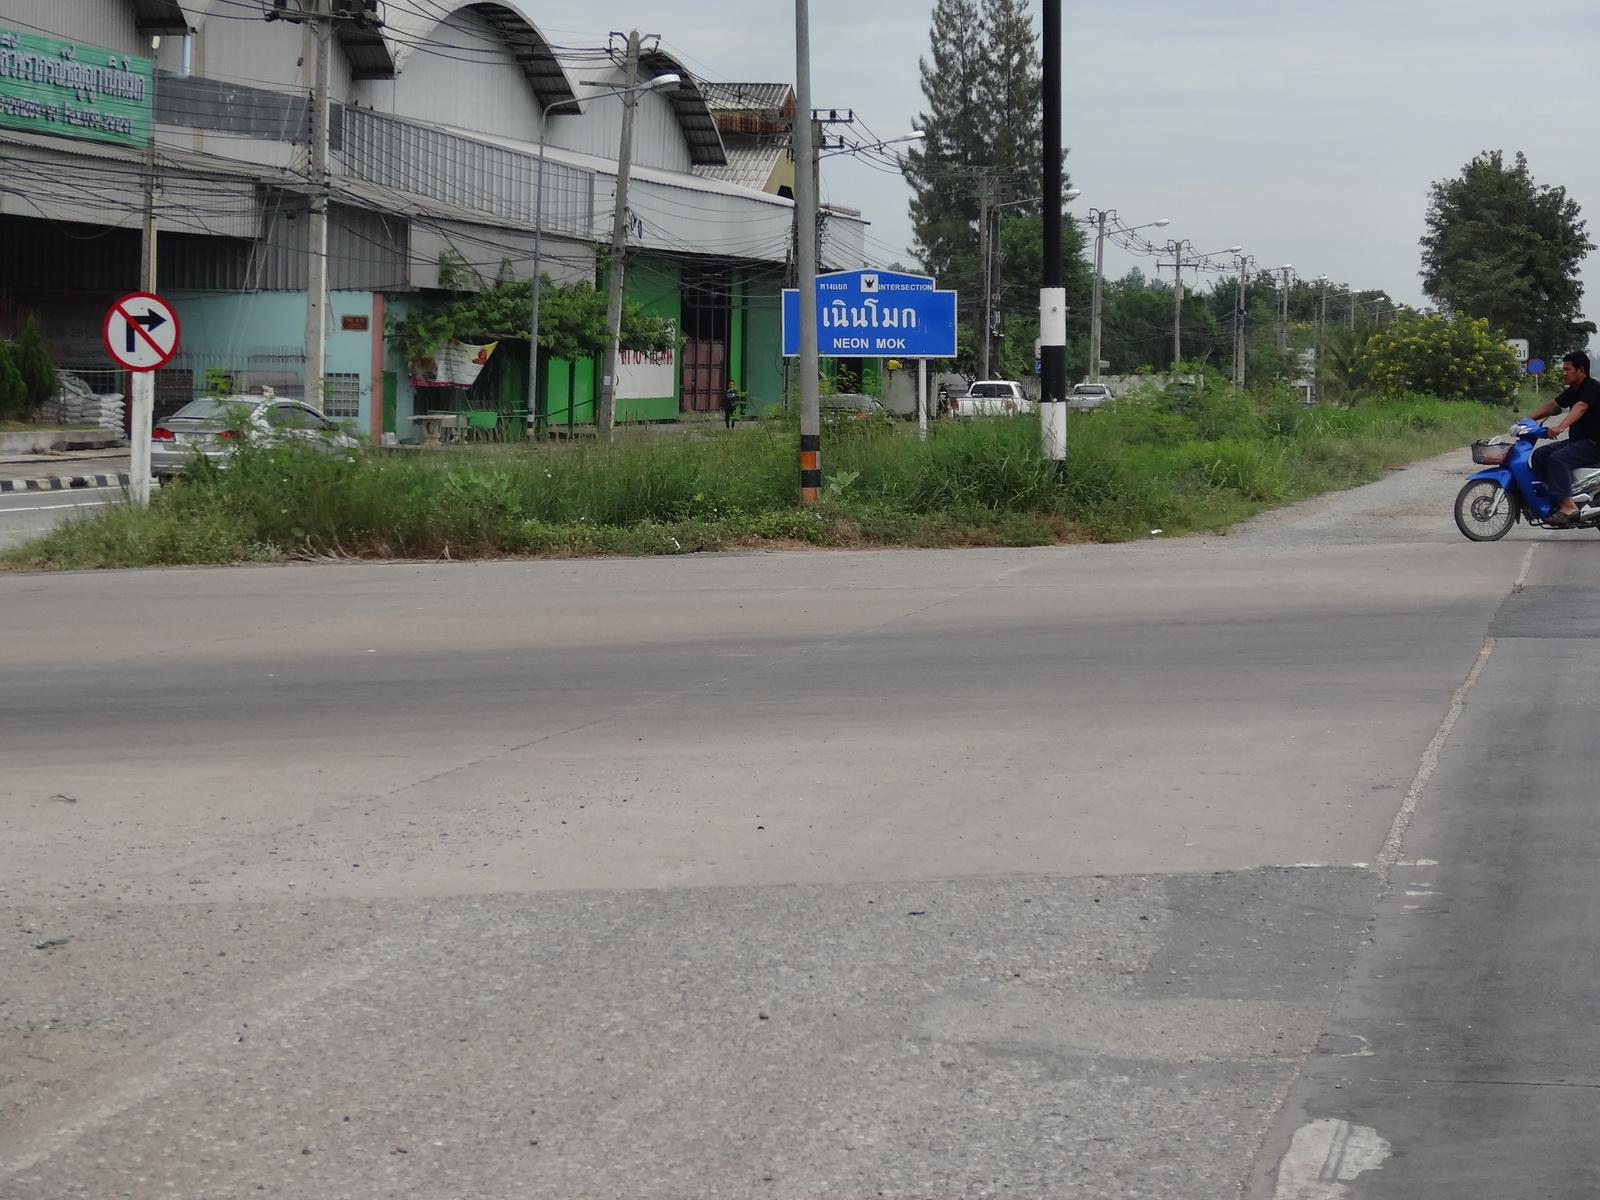 02-ueber-land-022